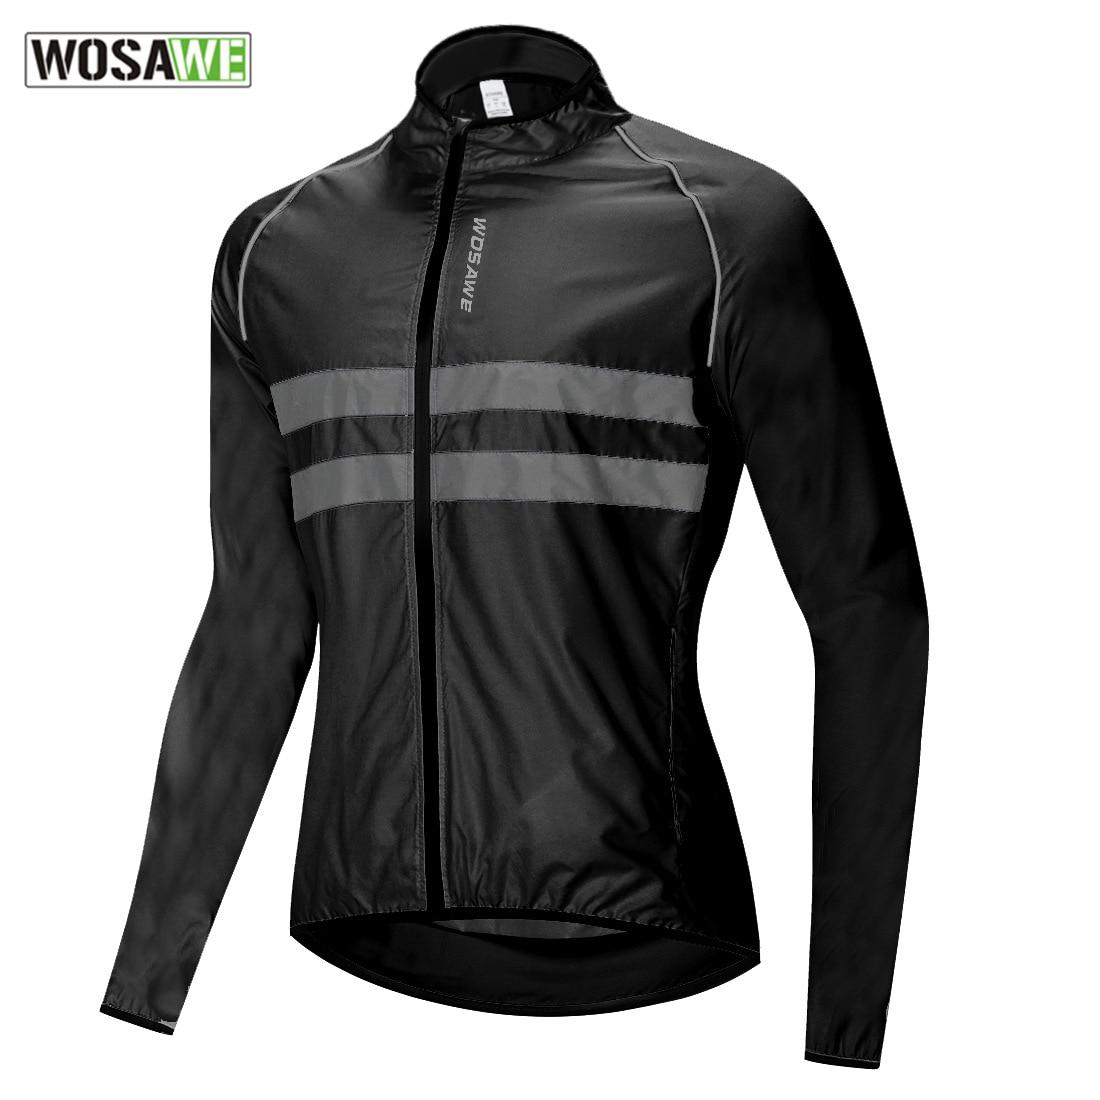 WOSAWE Ultralight Reflective Men's Cycling Jacket Long Waterproof Windproof Road Mountain Bike MTB Jackets Bicycle Windbreaker(China)